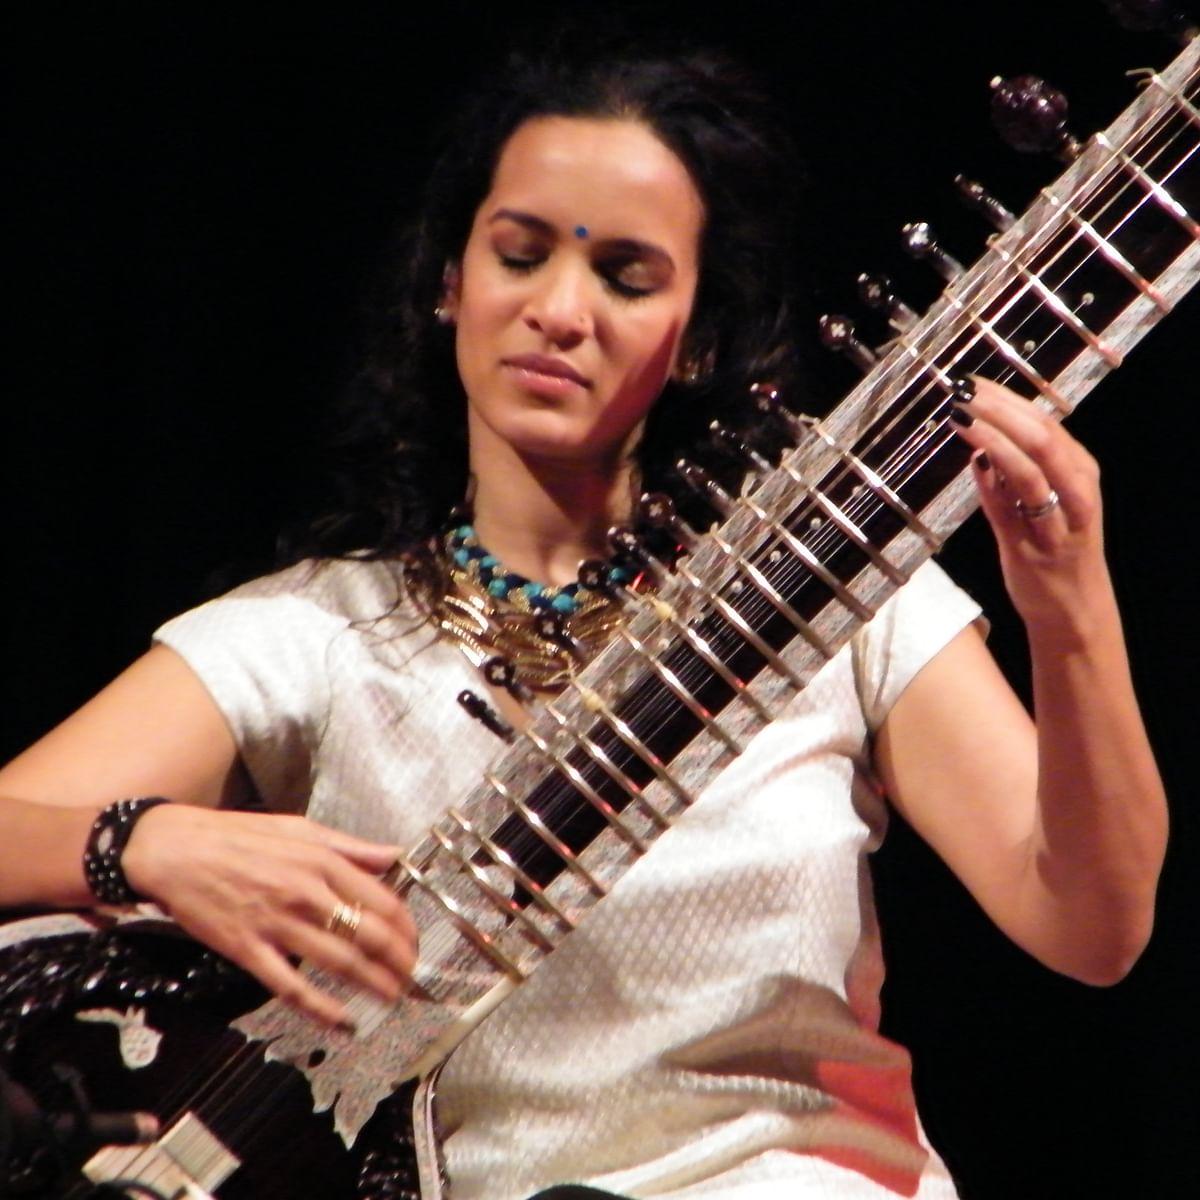 'The lyrics came from an inner vulnerable place': Anoushka Shankar on her new album Love Letters